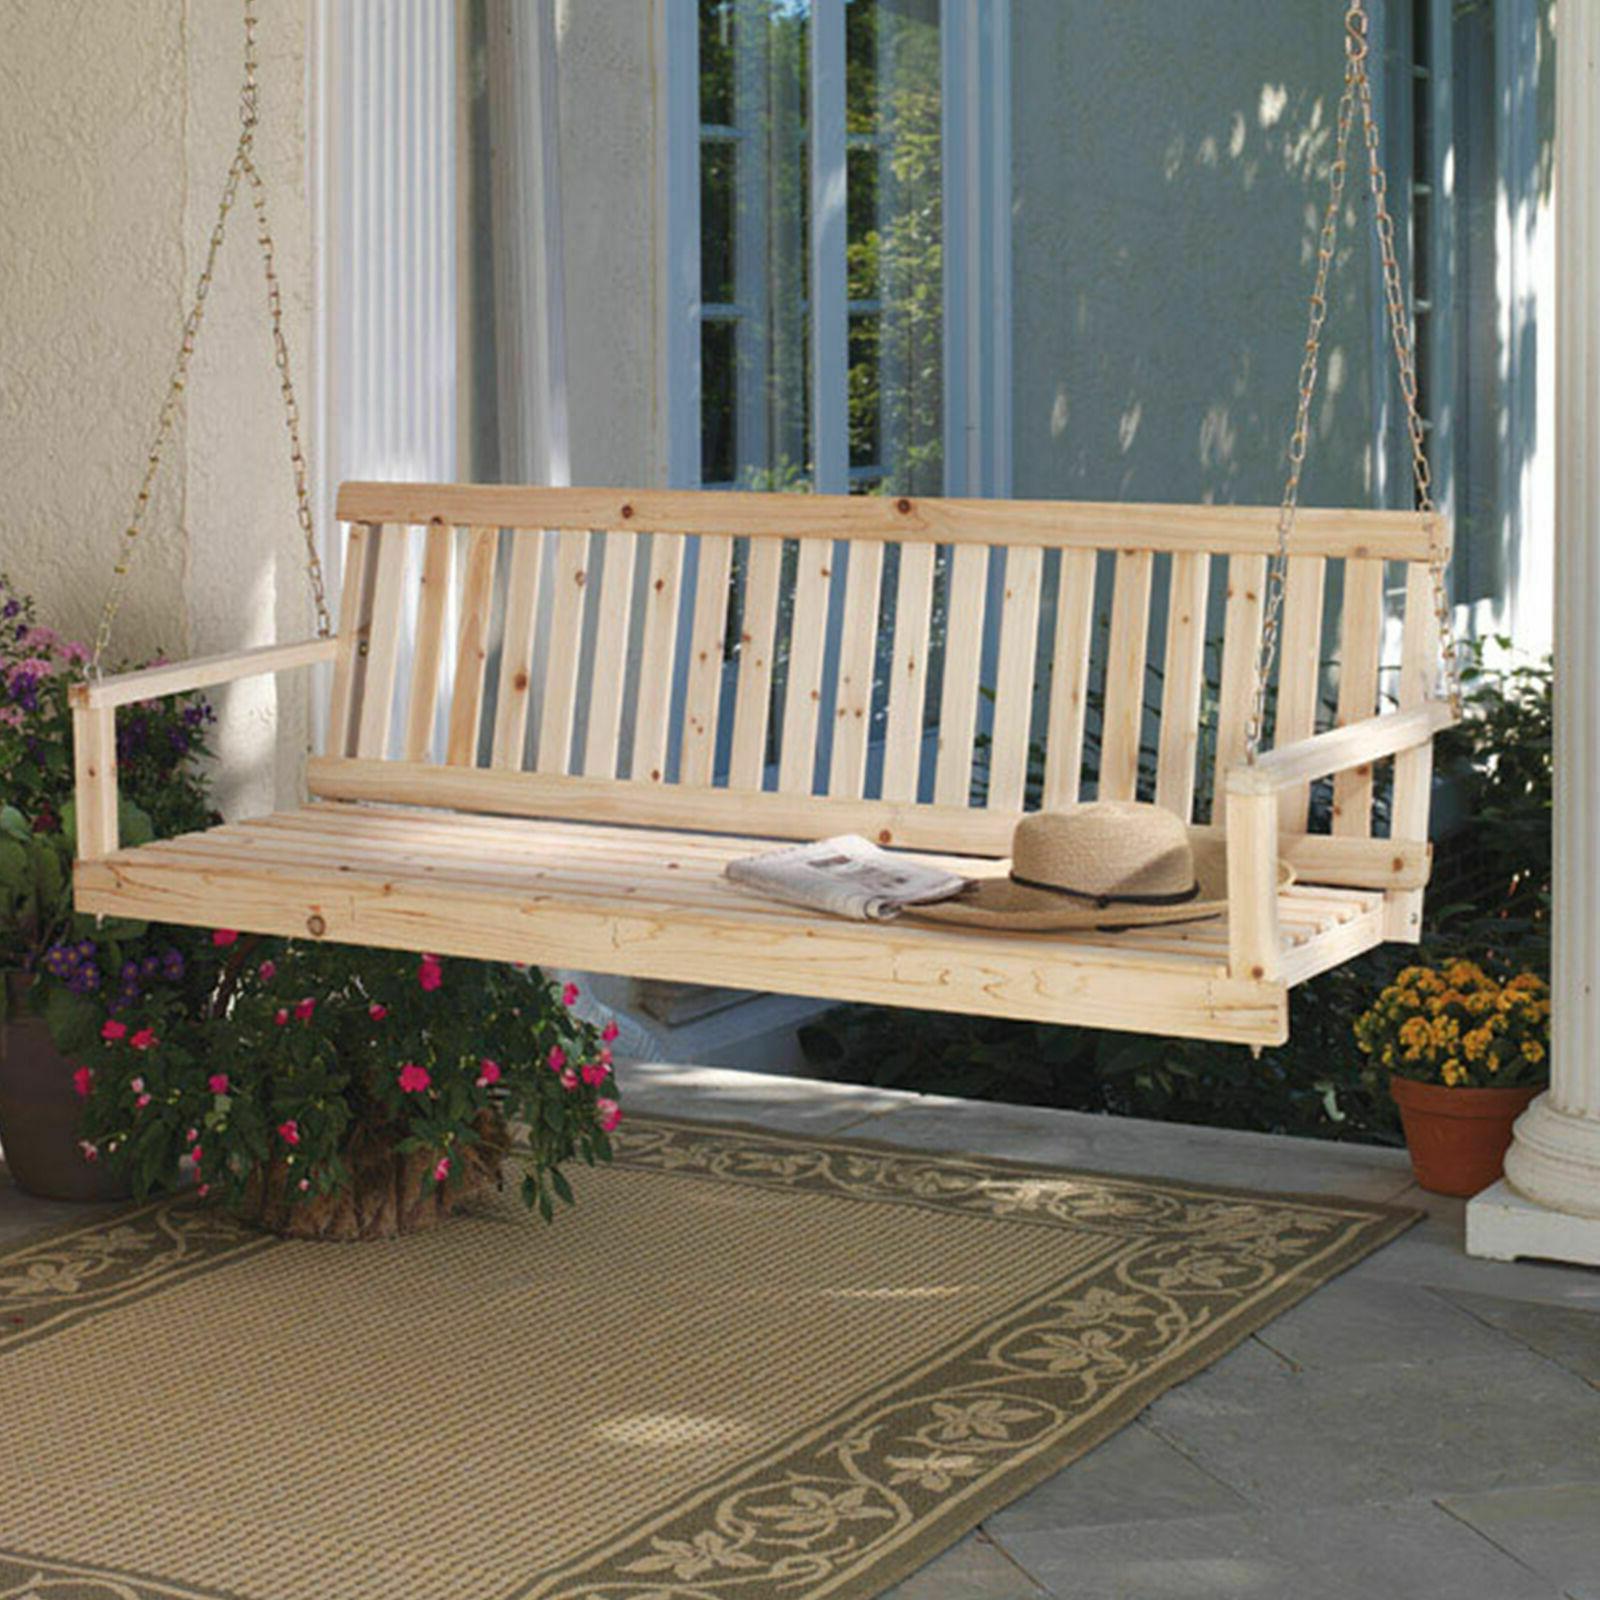 "Wooden Porch Swing Natural 60"" Width Patio Outdoor Garden Ya"